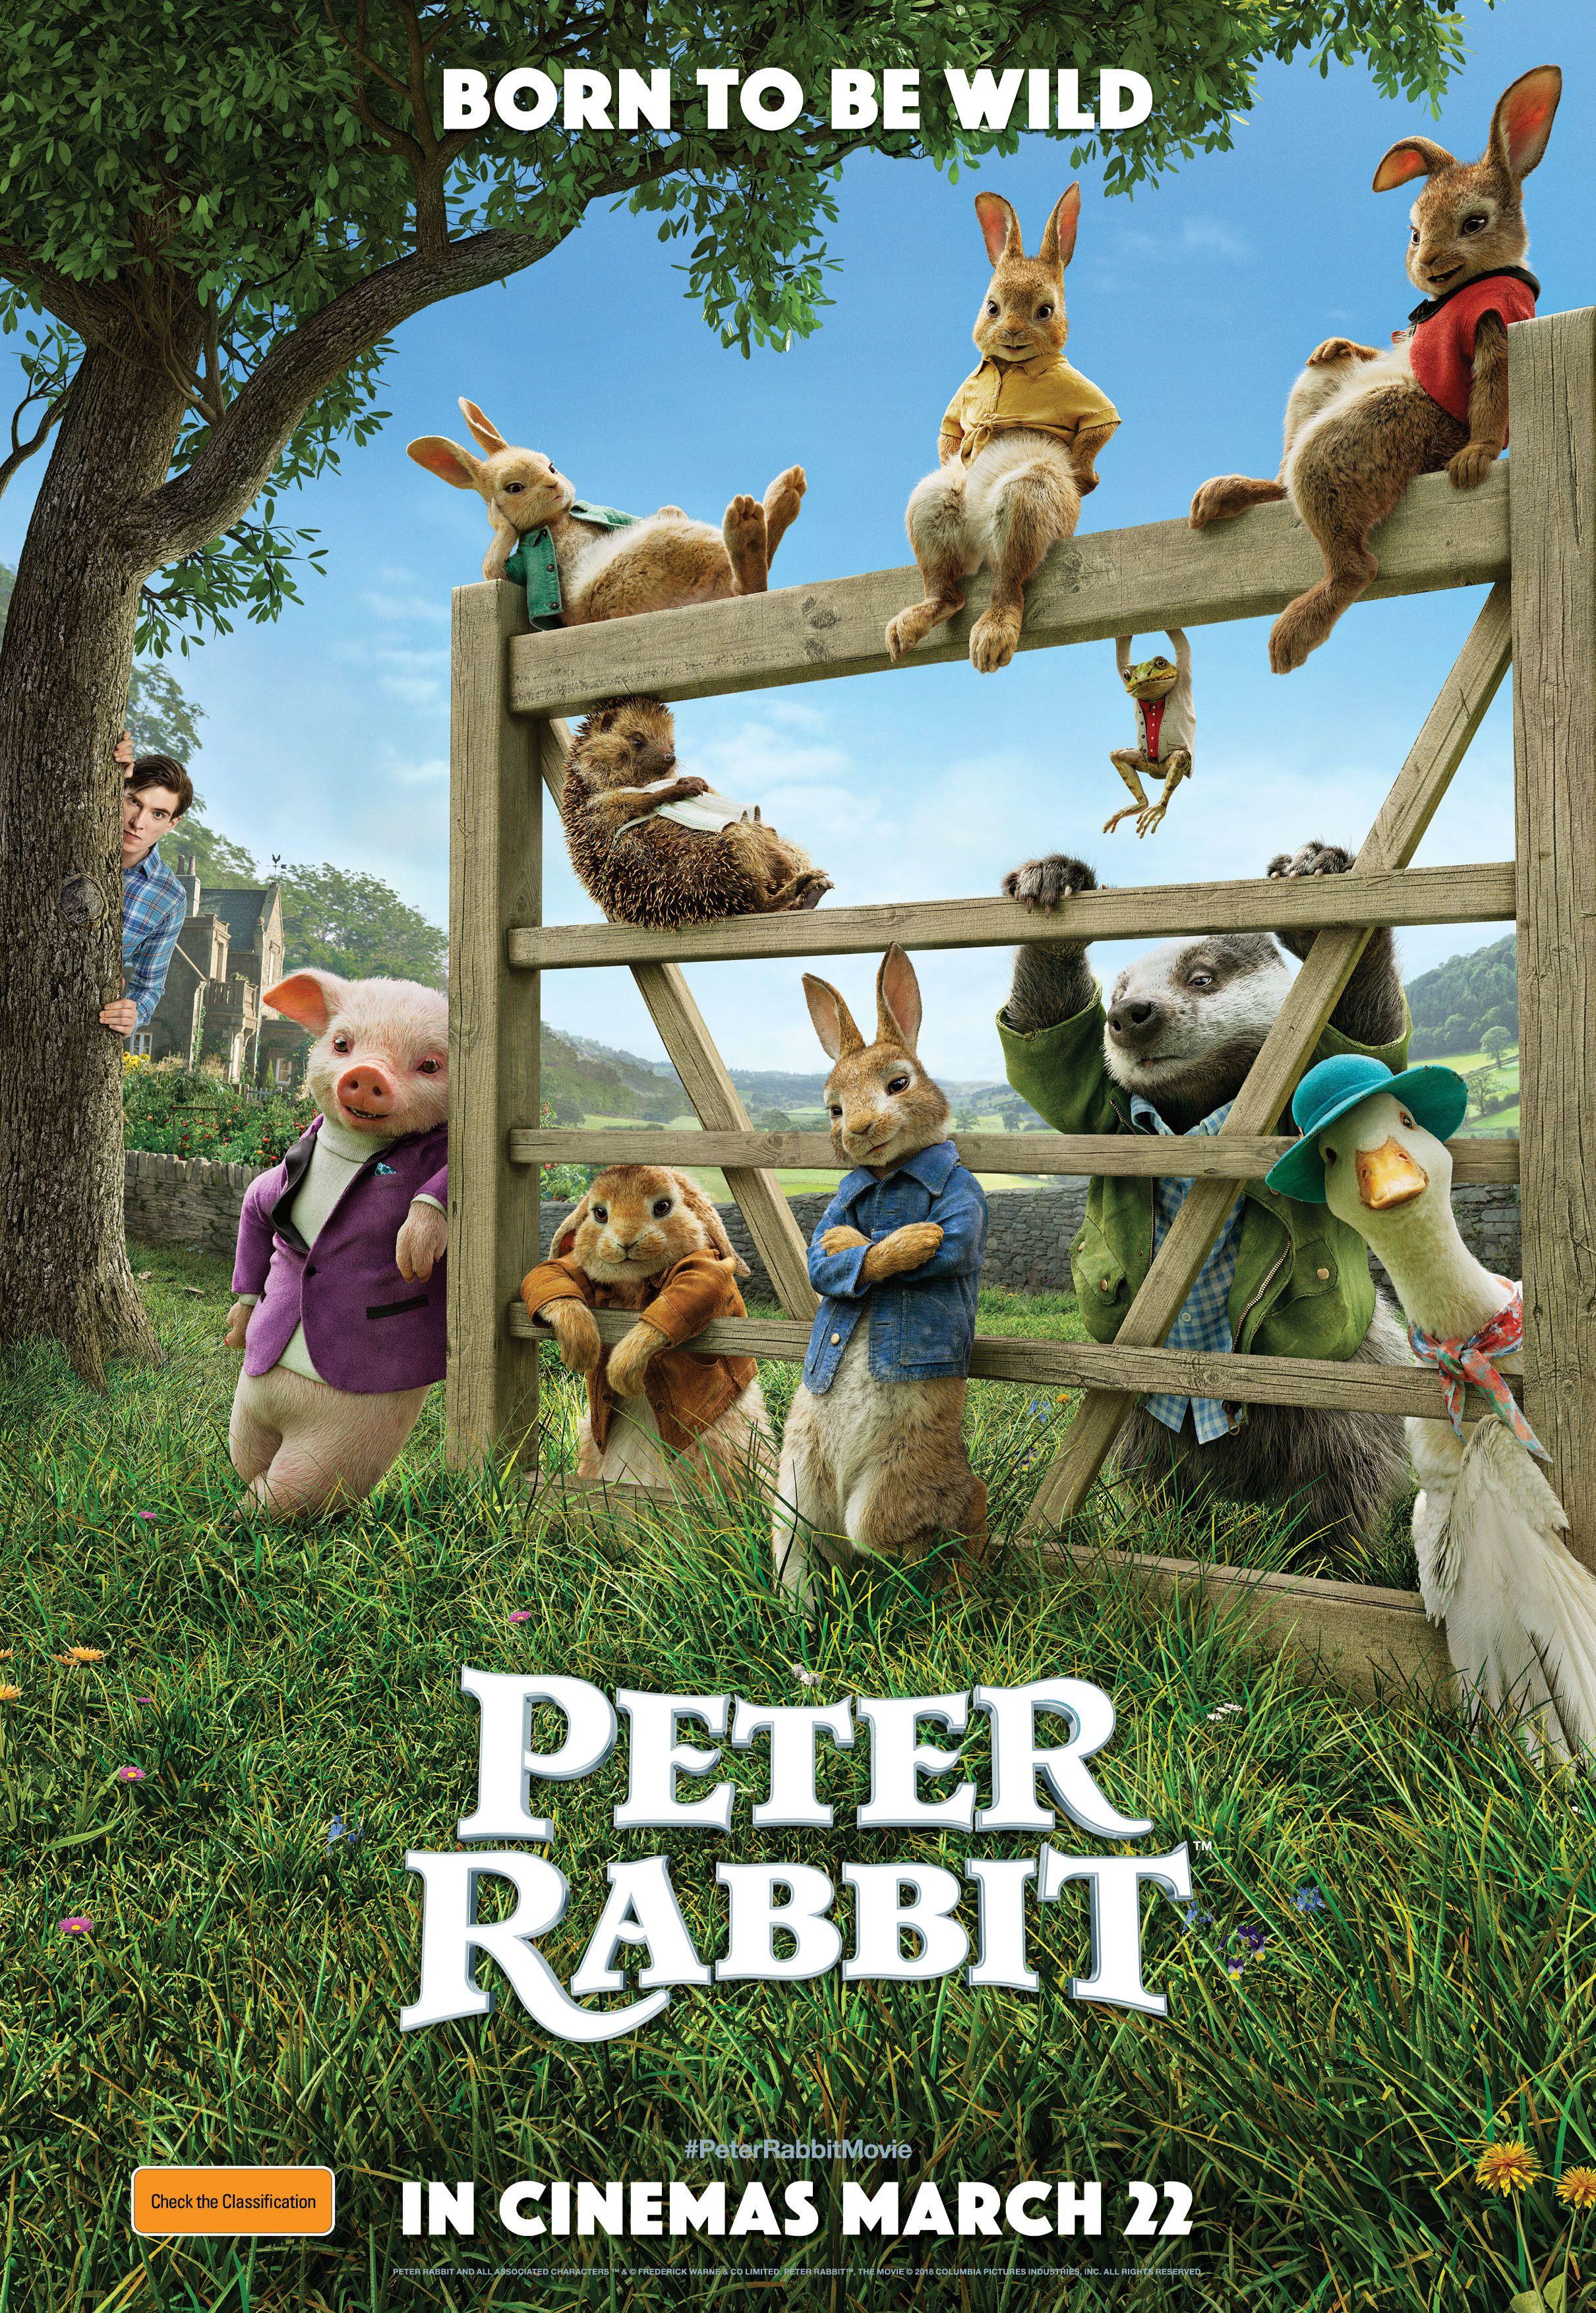 Peter Rabbit 2018 Peter Rabbit Movie Peter Rabbit Full Movies Online Free